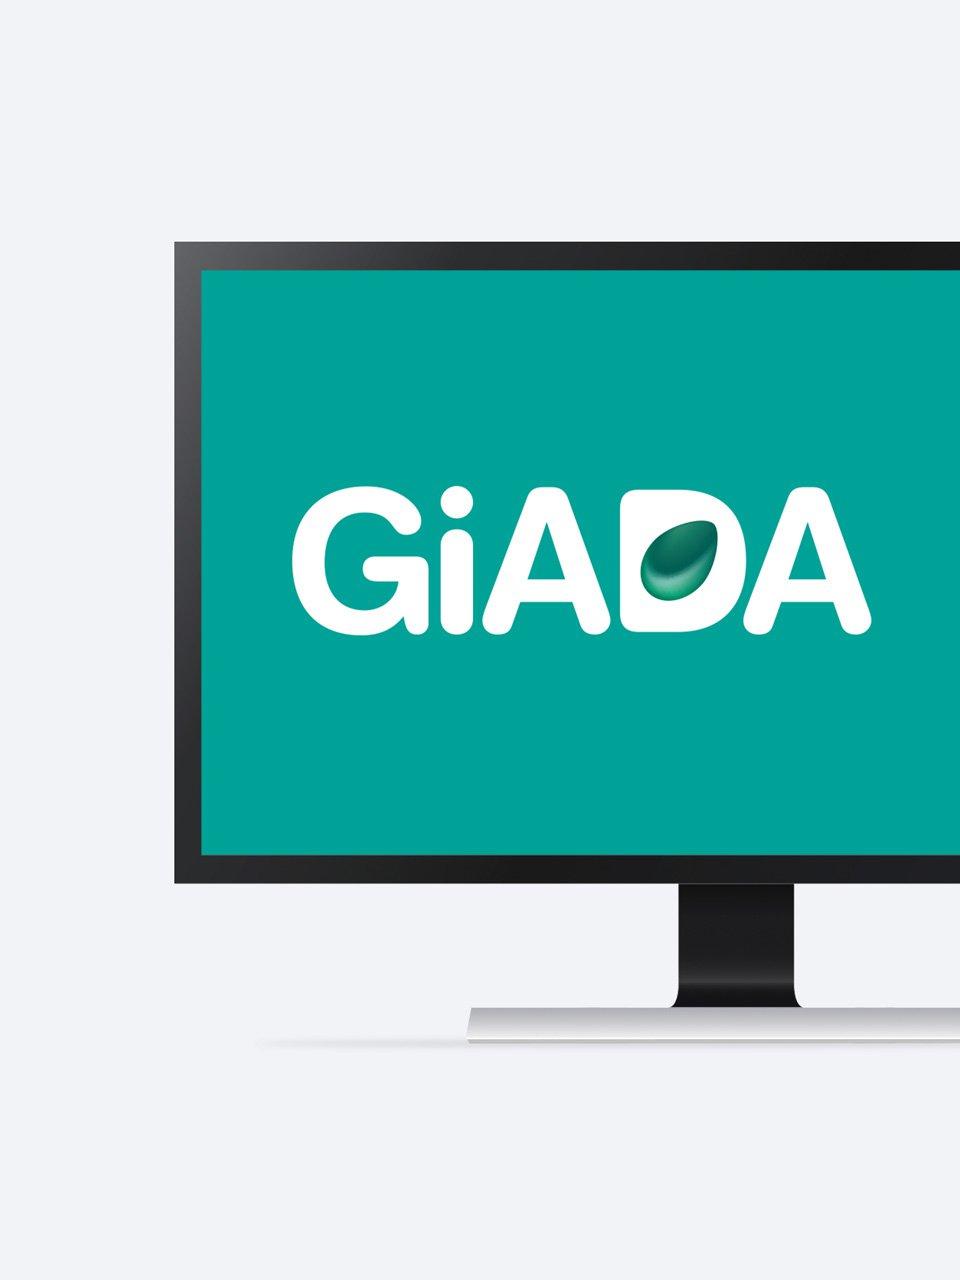 GiADA - Giada - Erickson